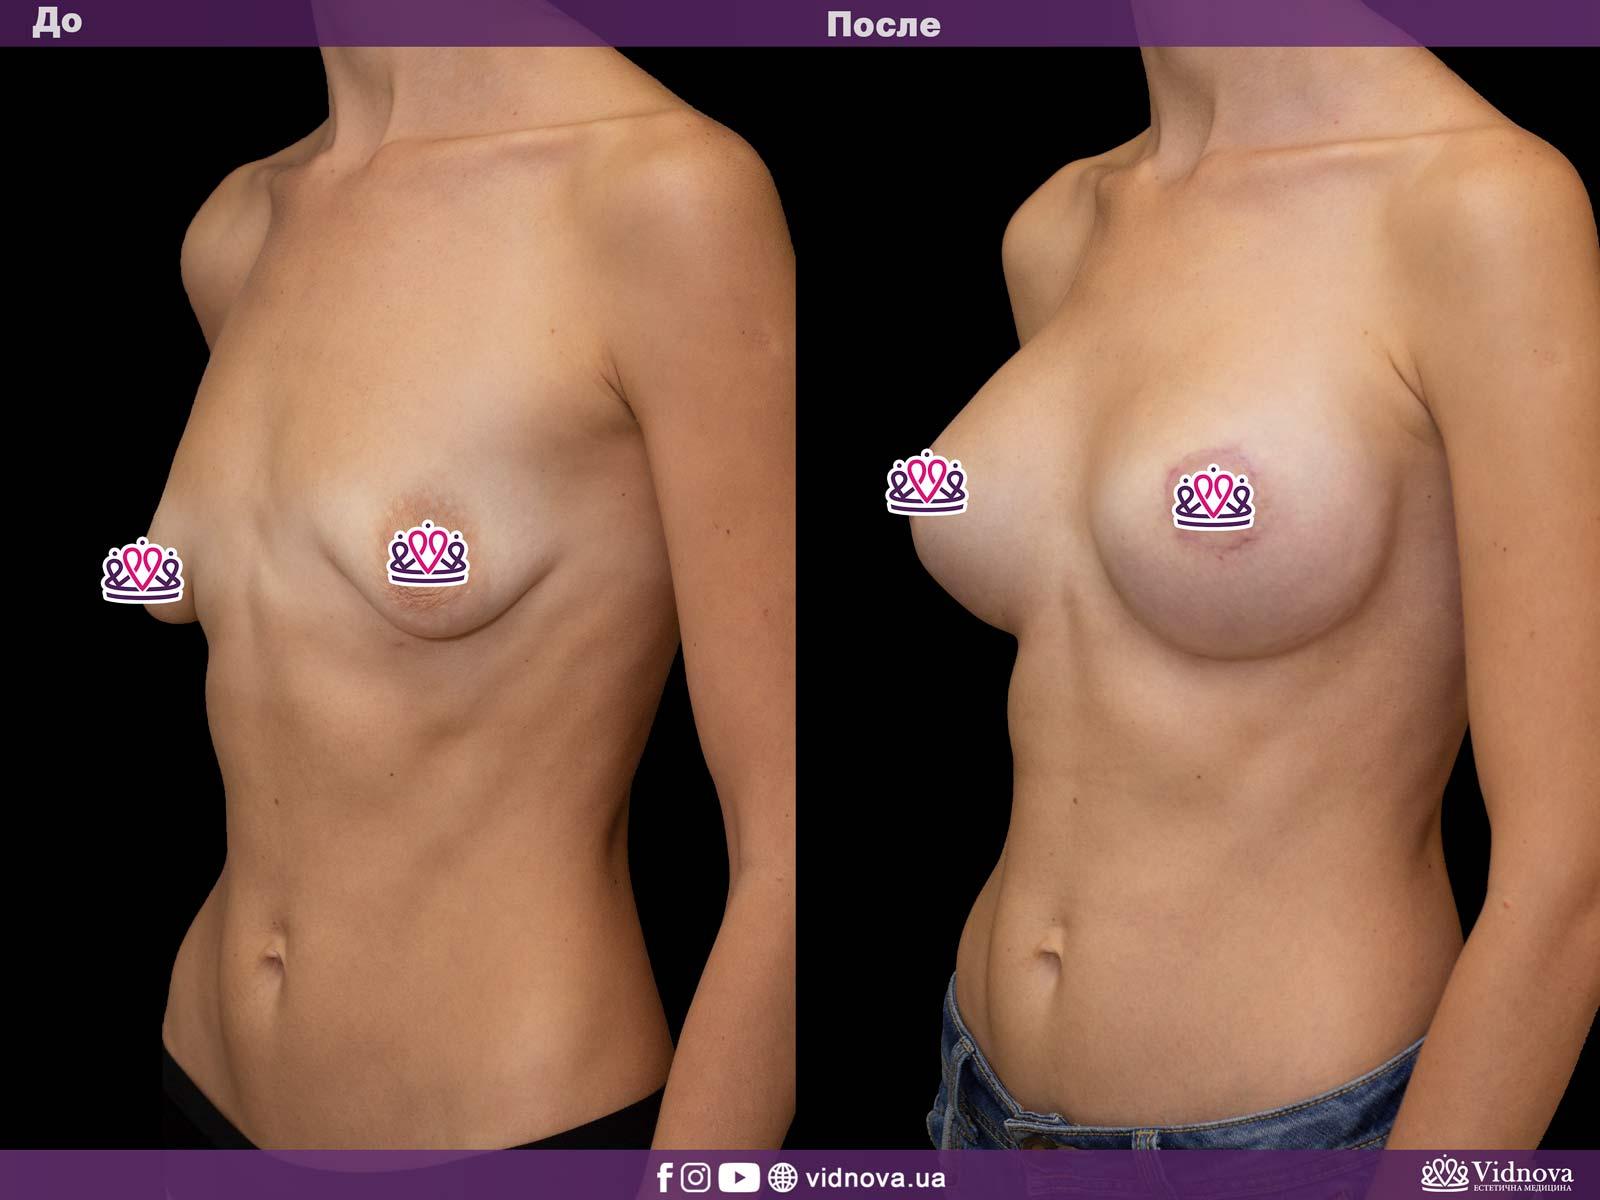 Подтяжка груди: Фото ДО и ПОСЛЕ - Пример №11-2 - Клиника Vidnova